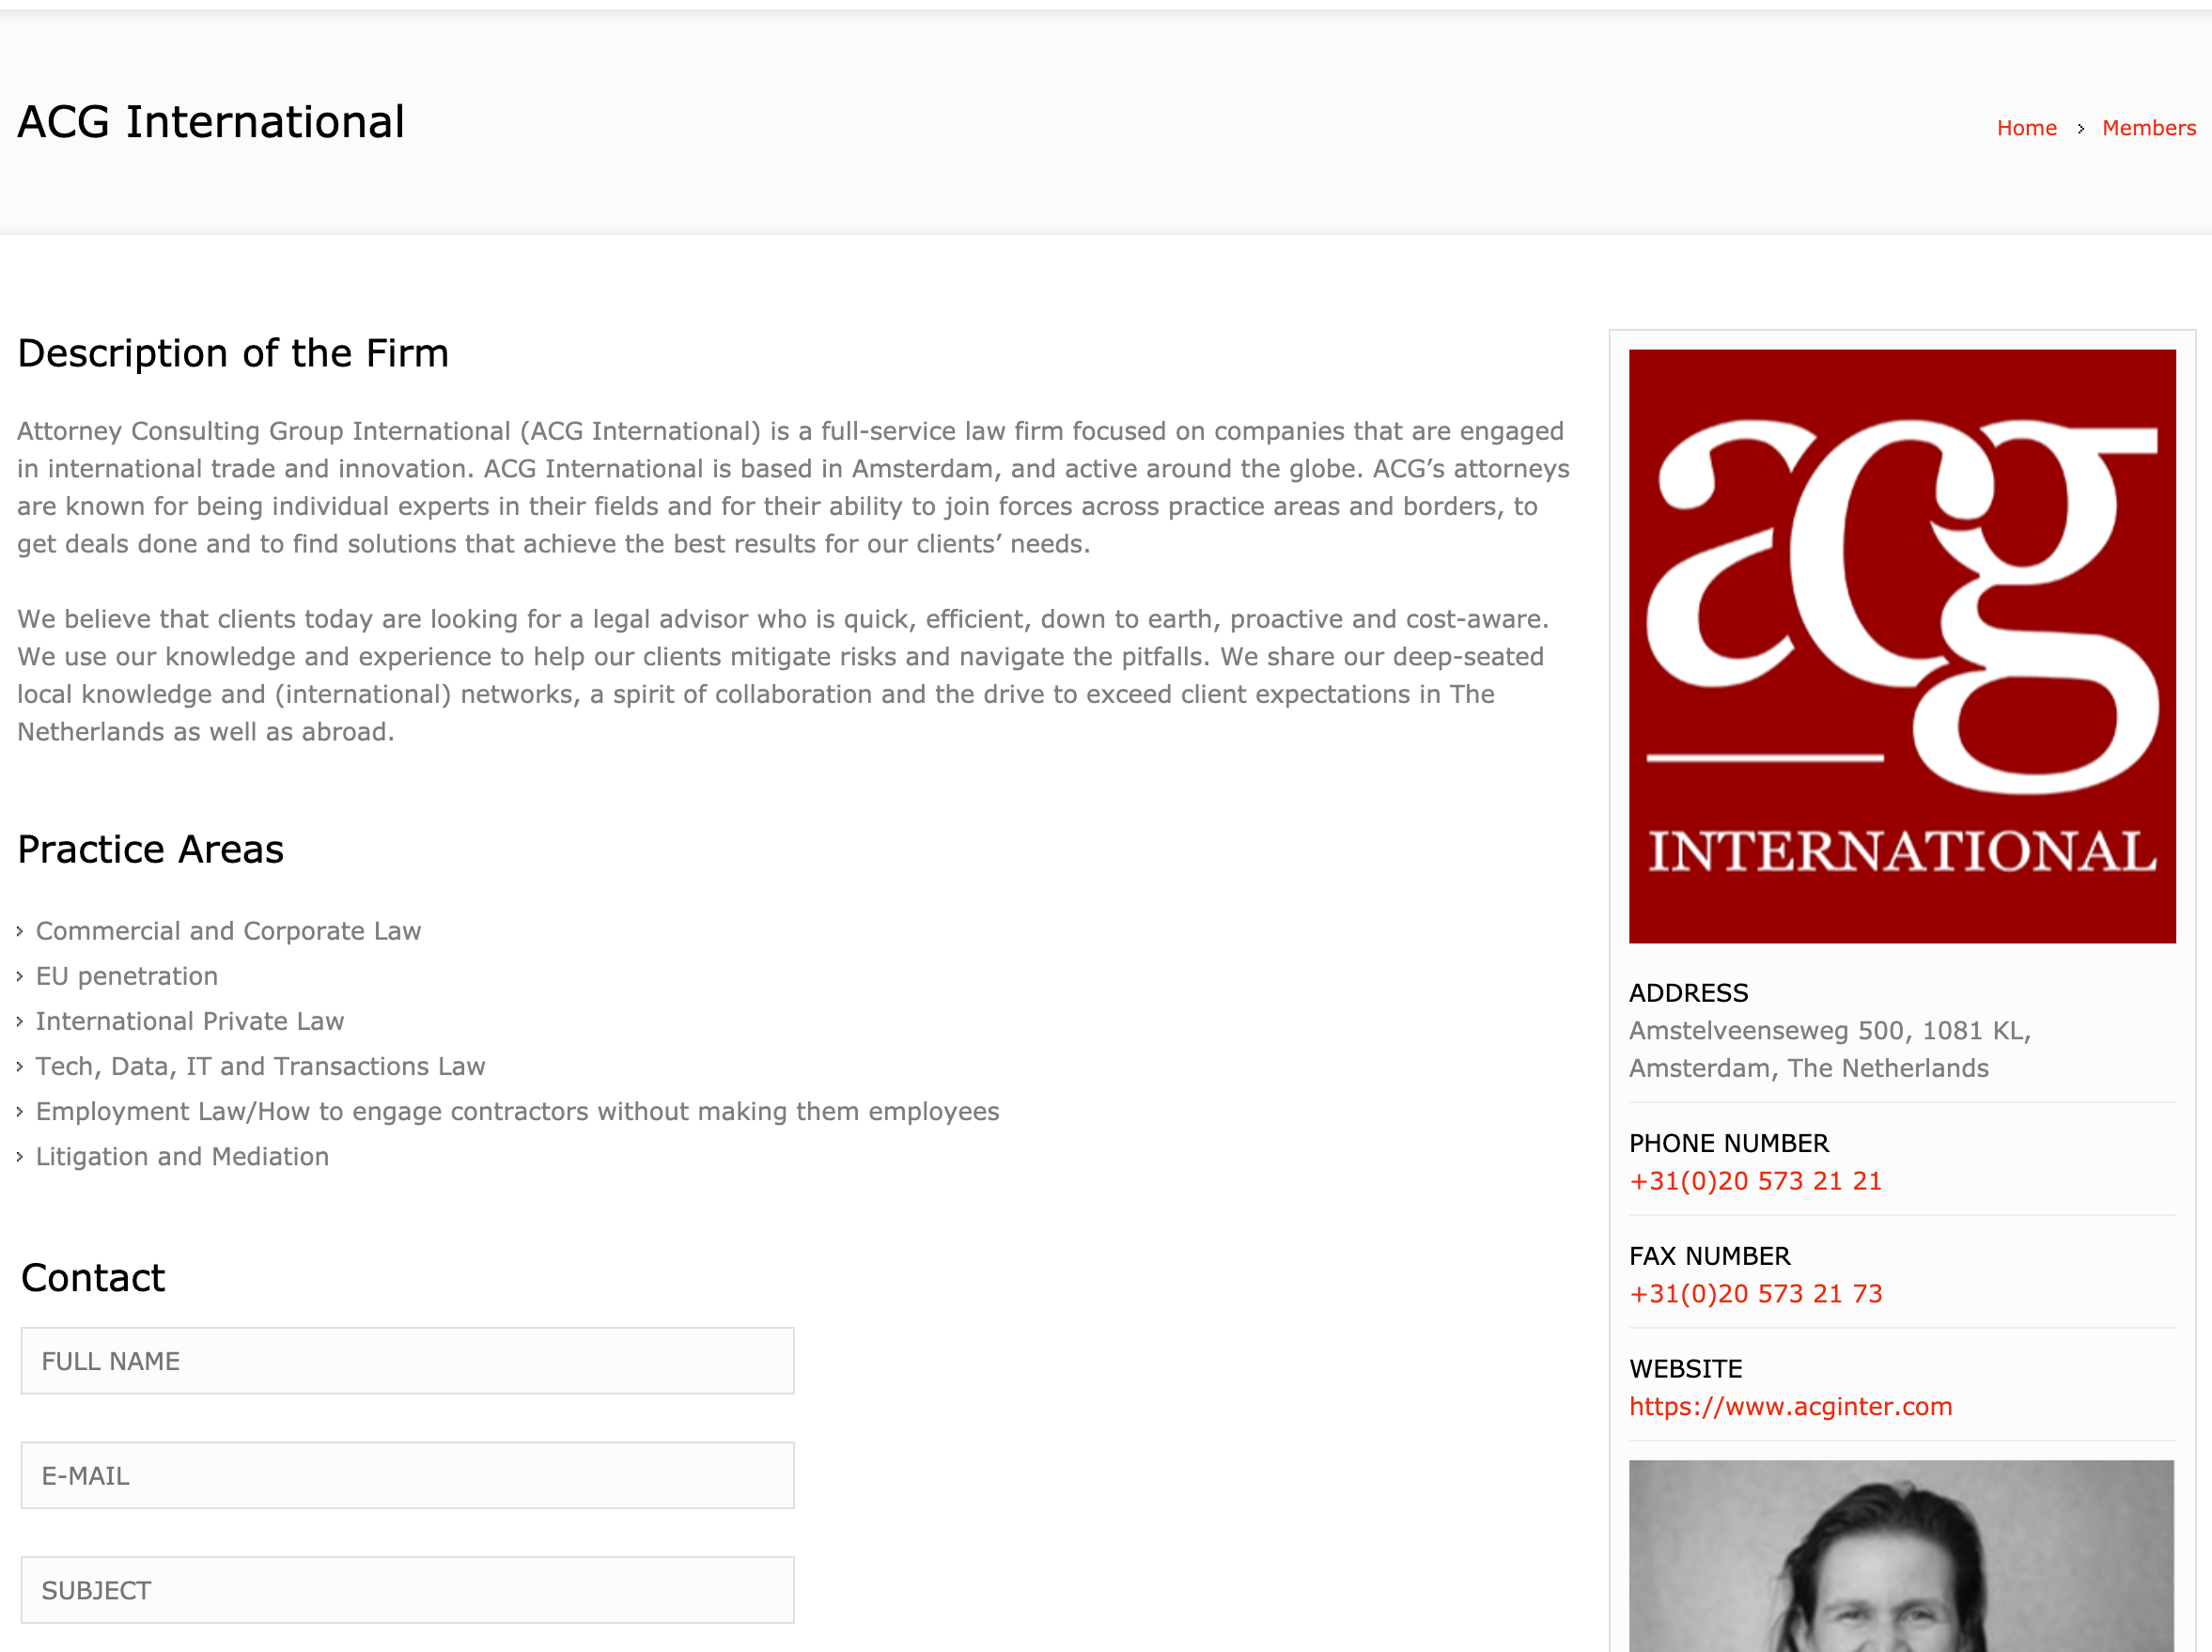 EALG Firma Detay